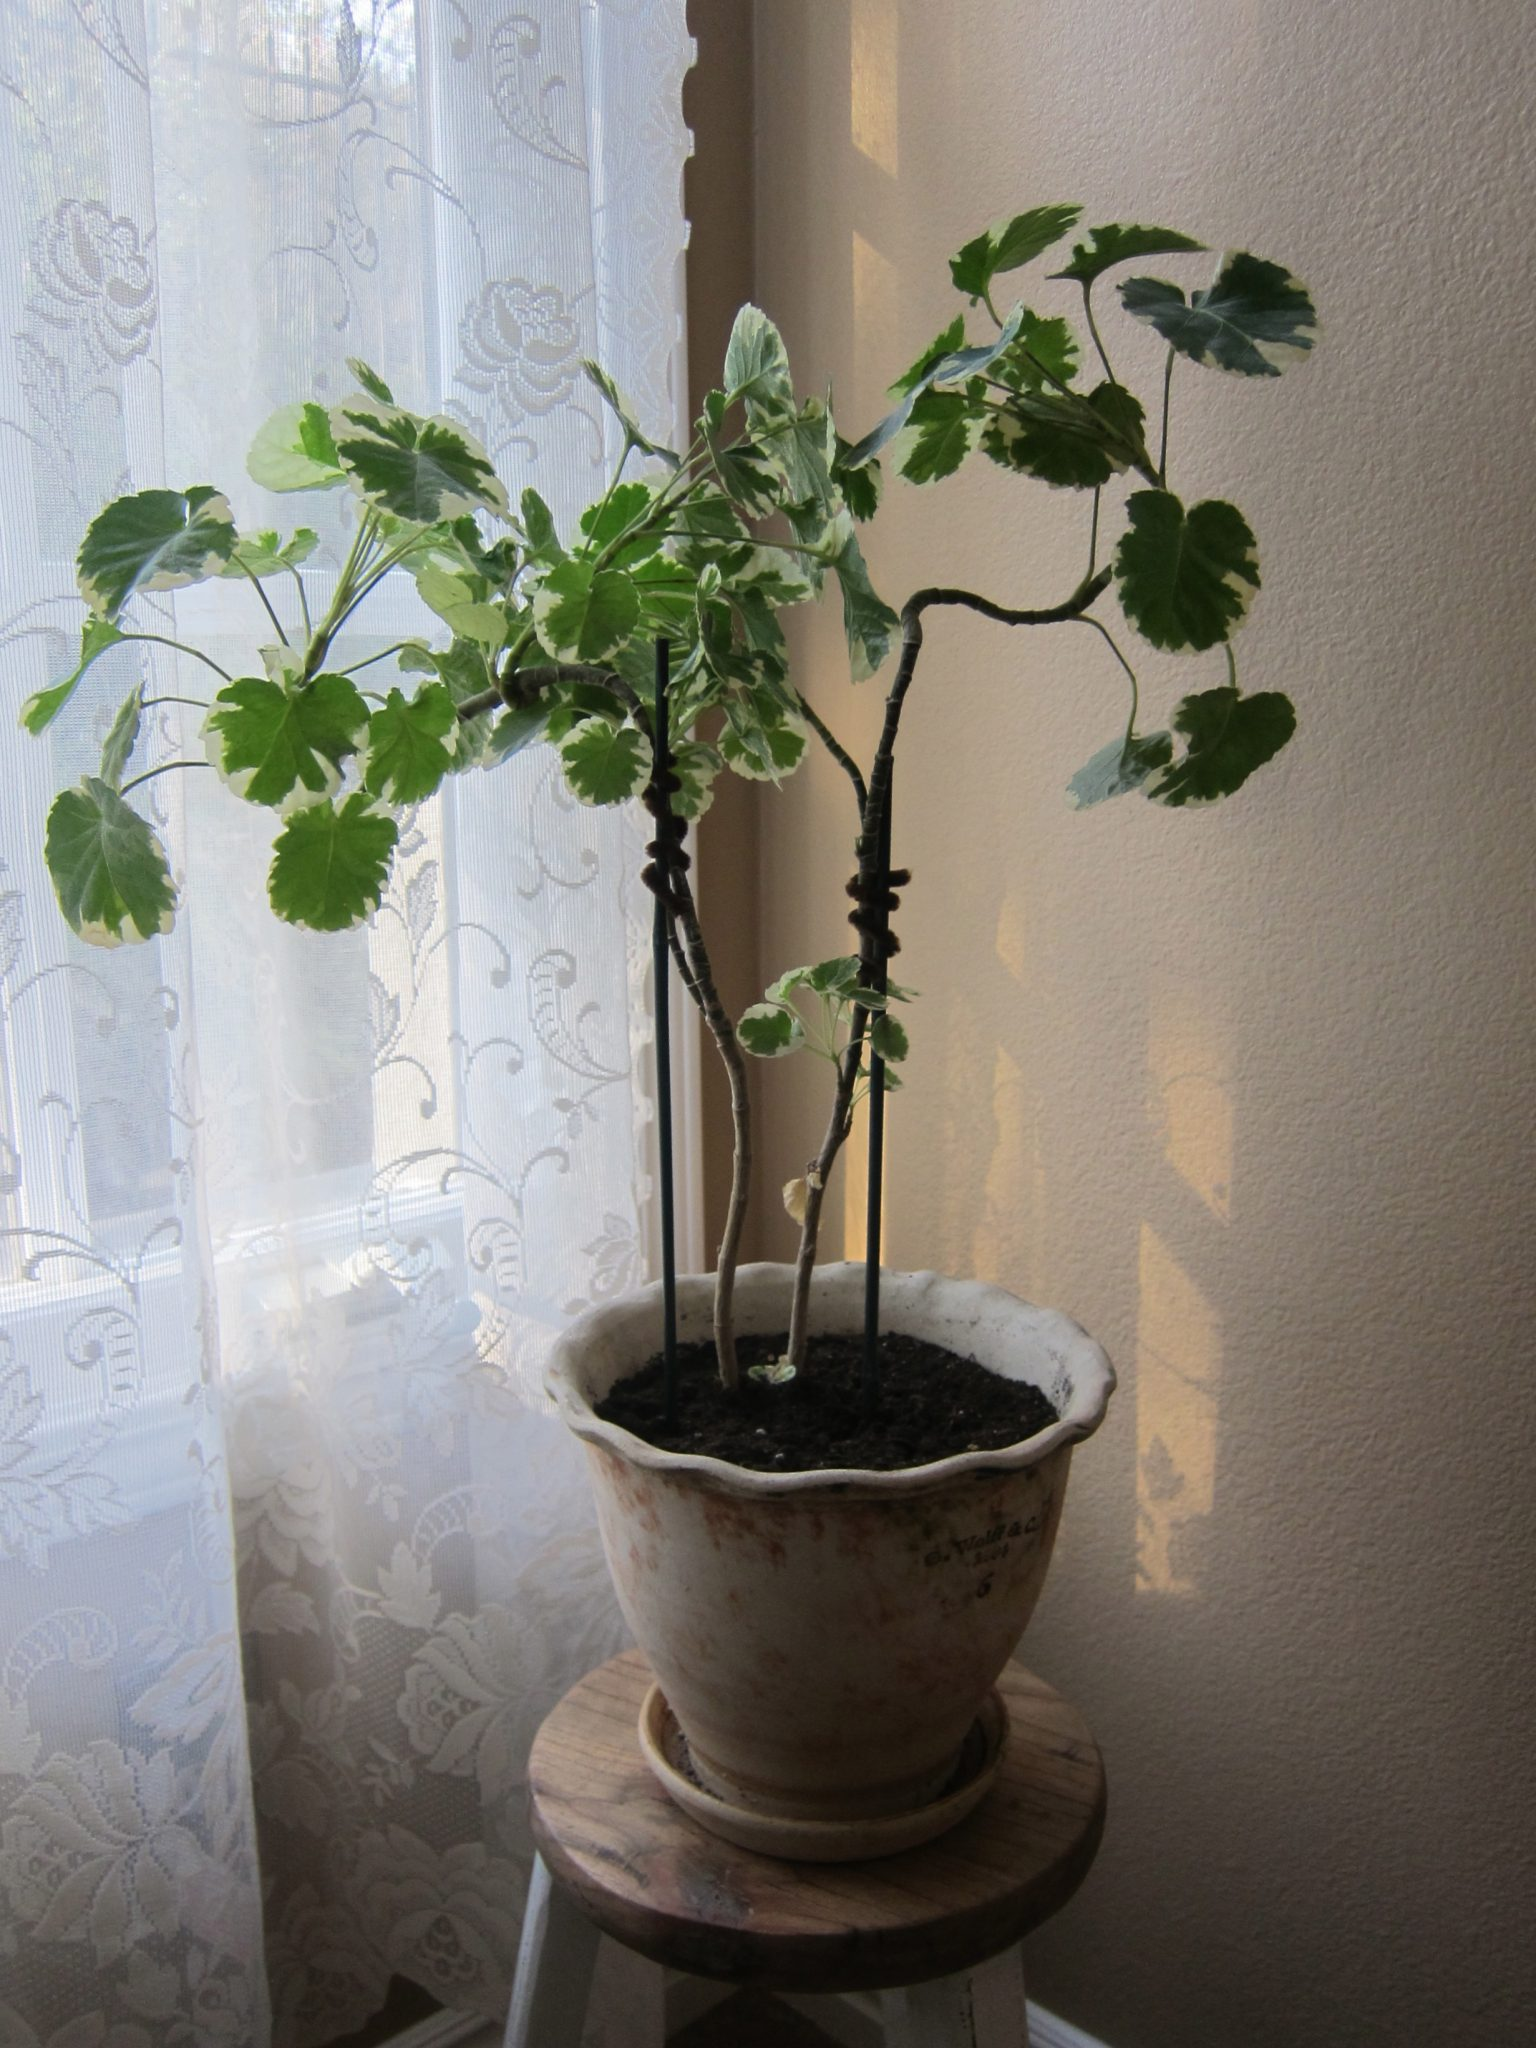 Variegated leaf plant